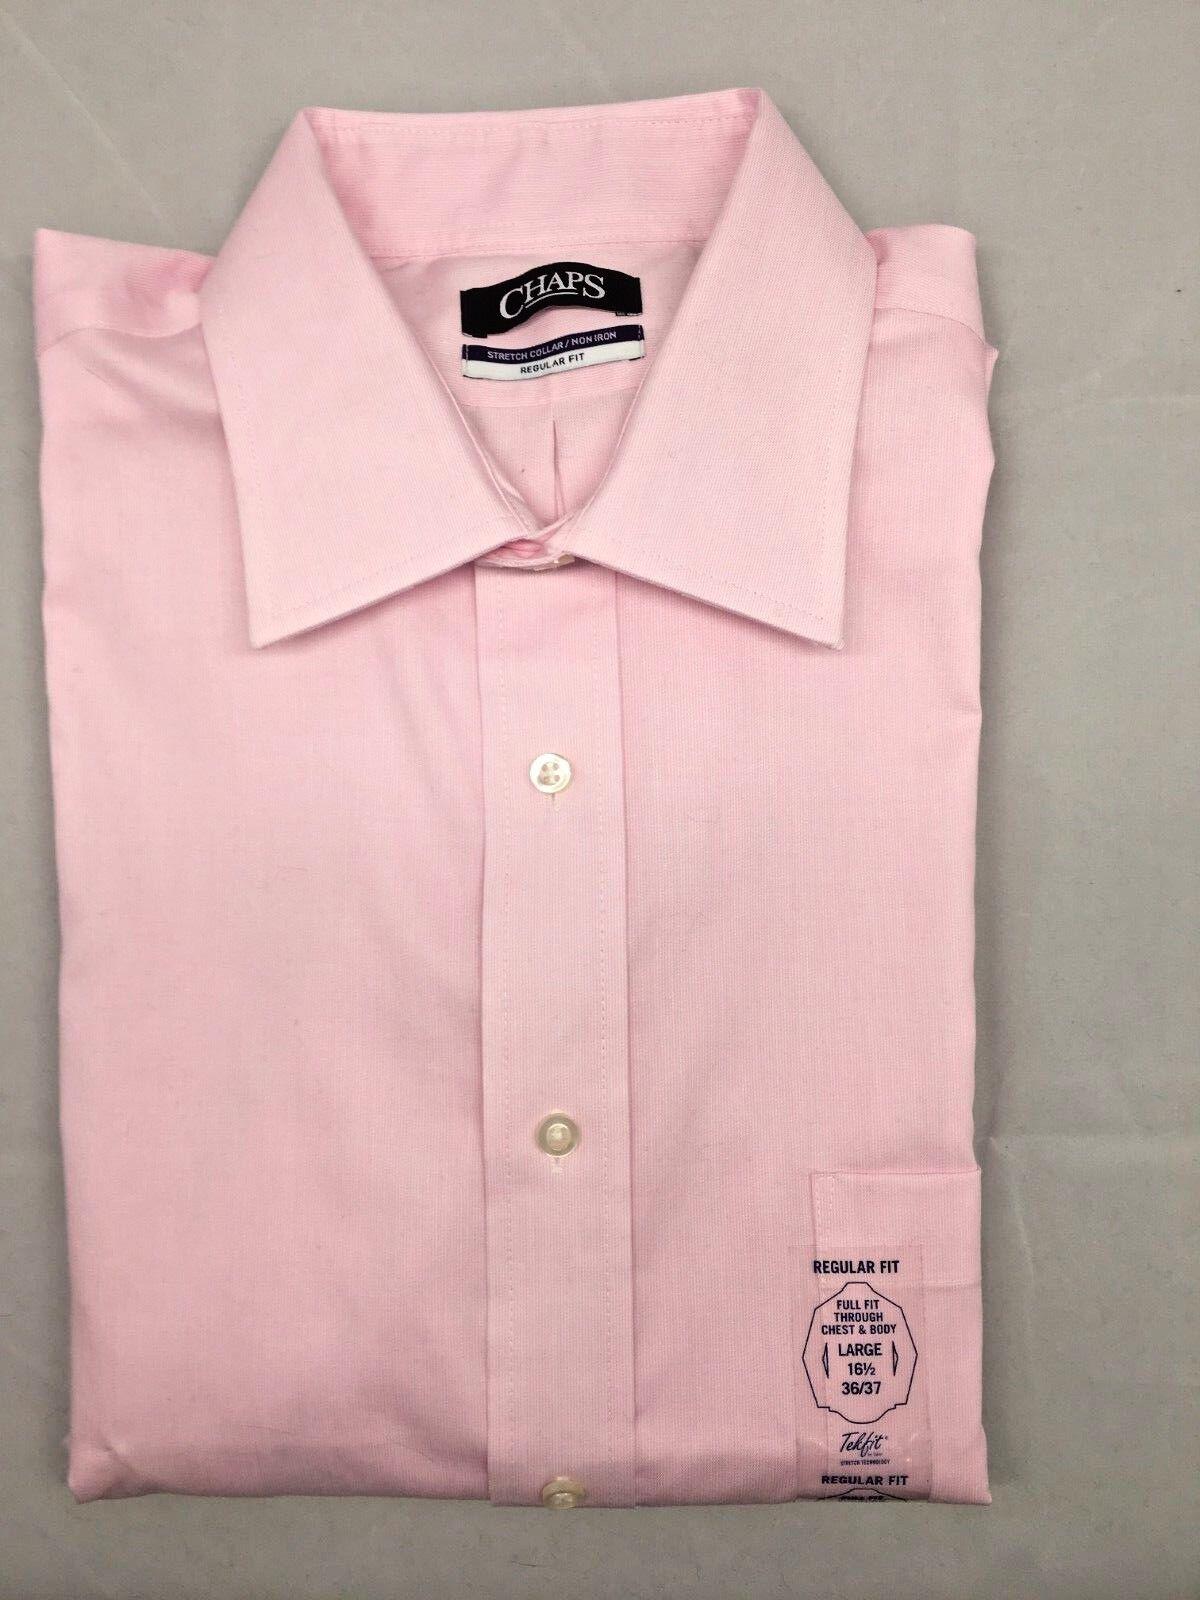 CHAPS $65 Pink REG FIT NON IRON STRETCH COLLAR Cotton Dress